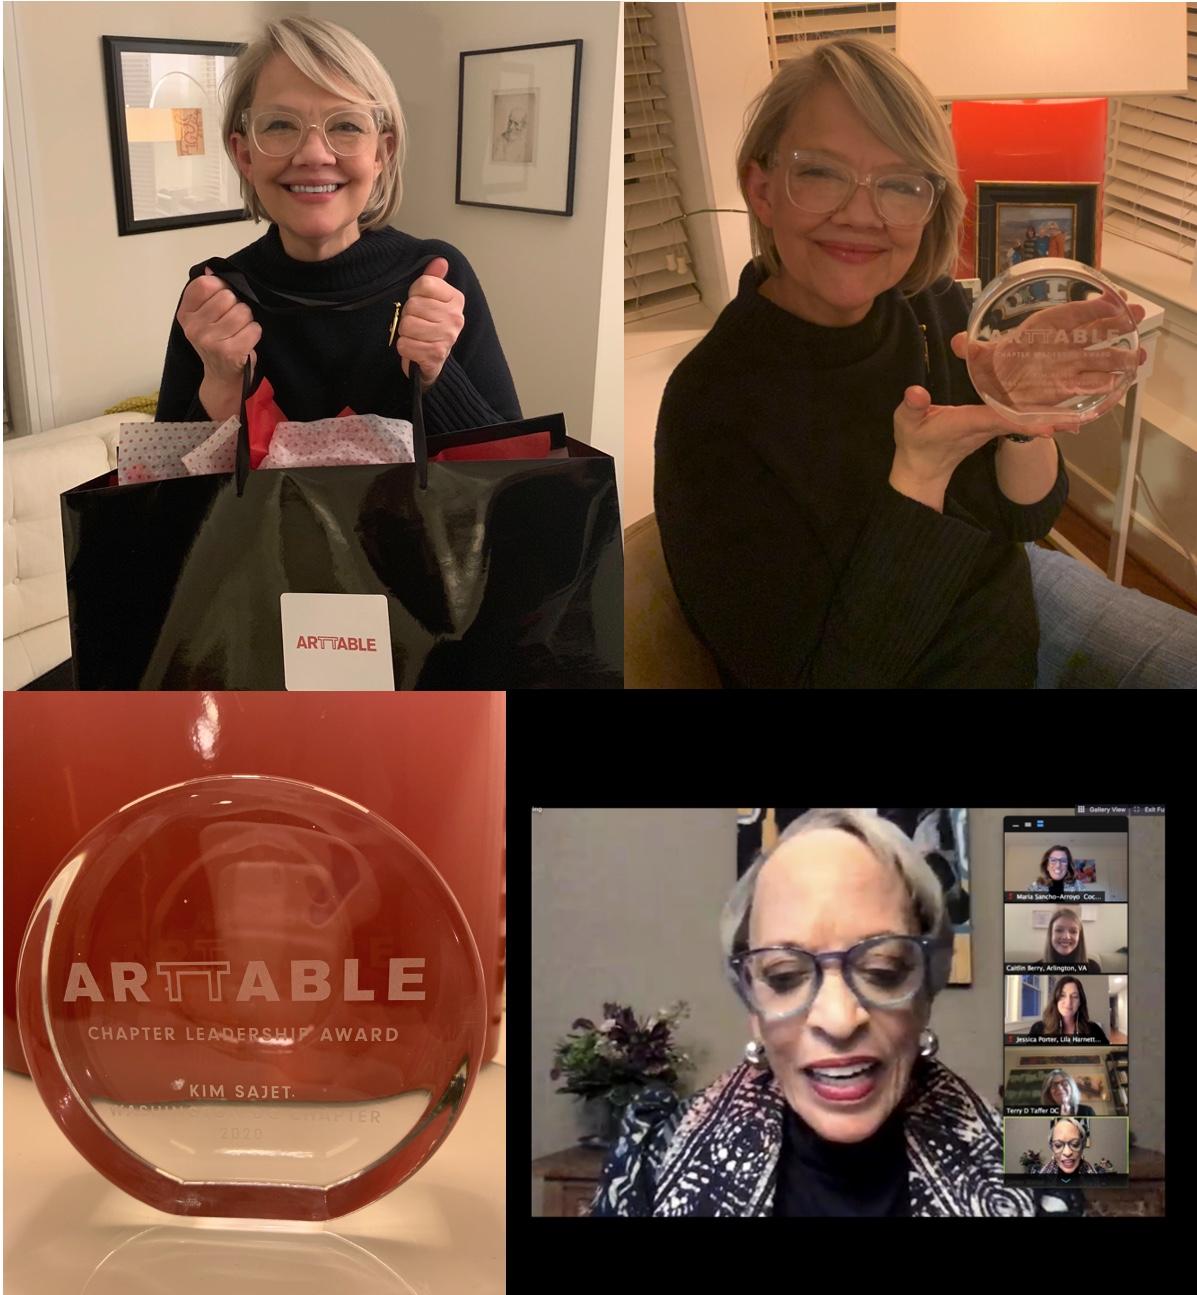 Art Table Leadership Award